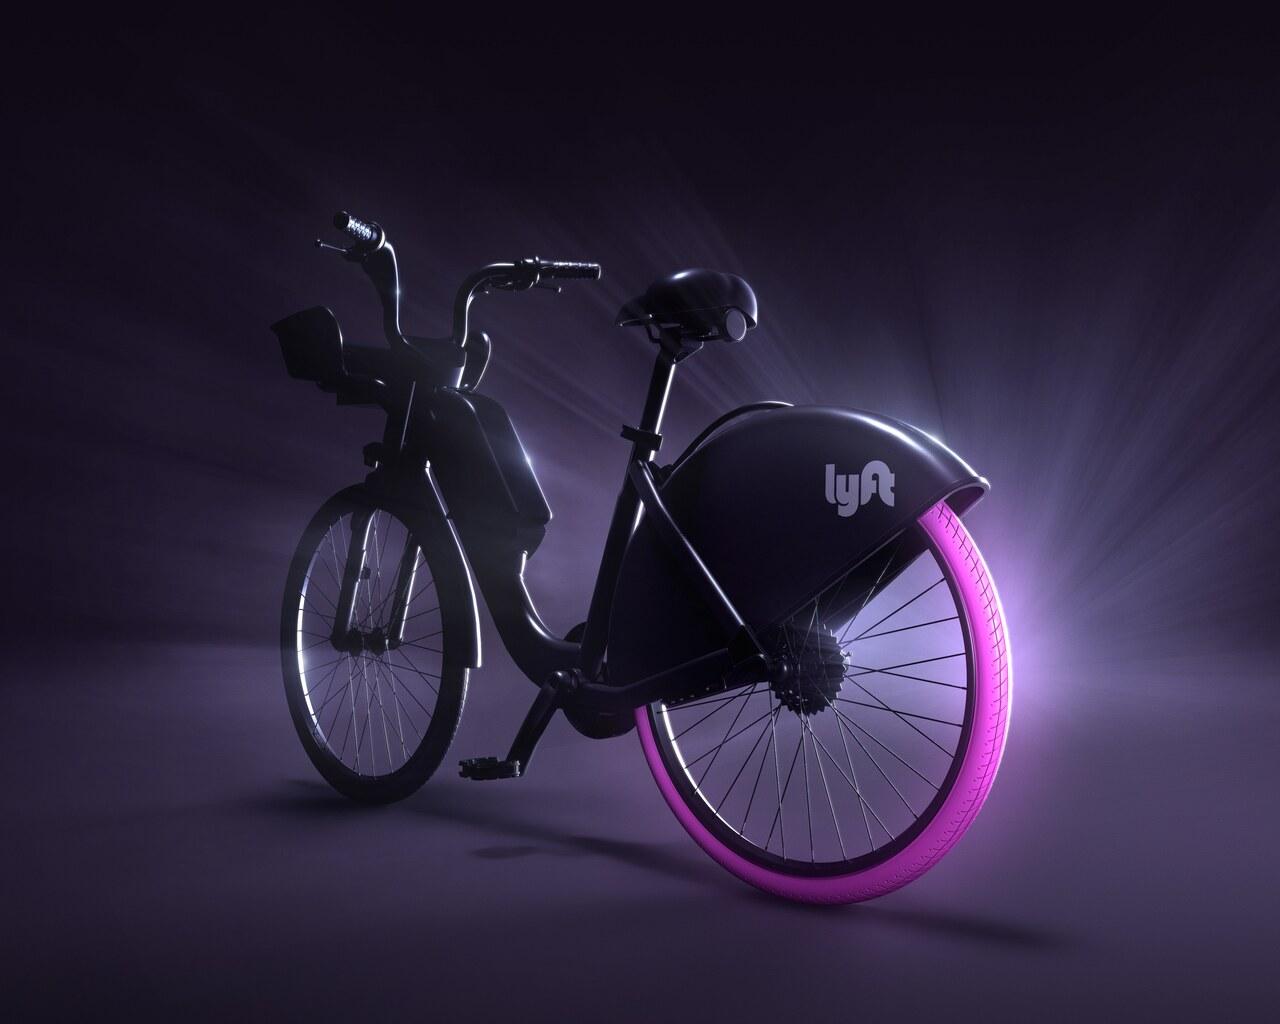 cycle-art-7w.jpg